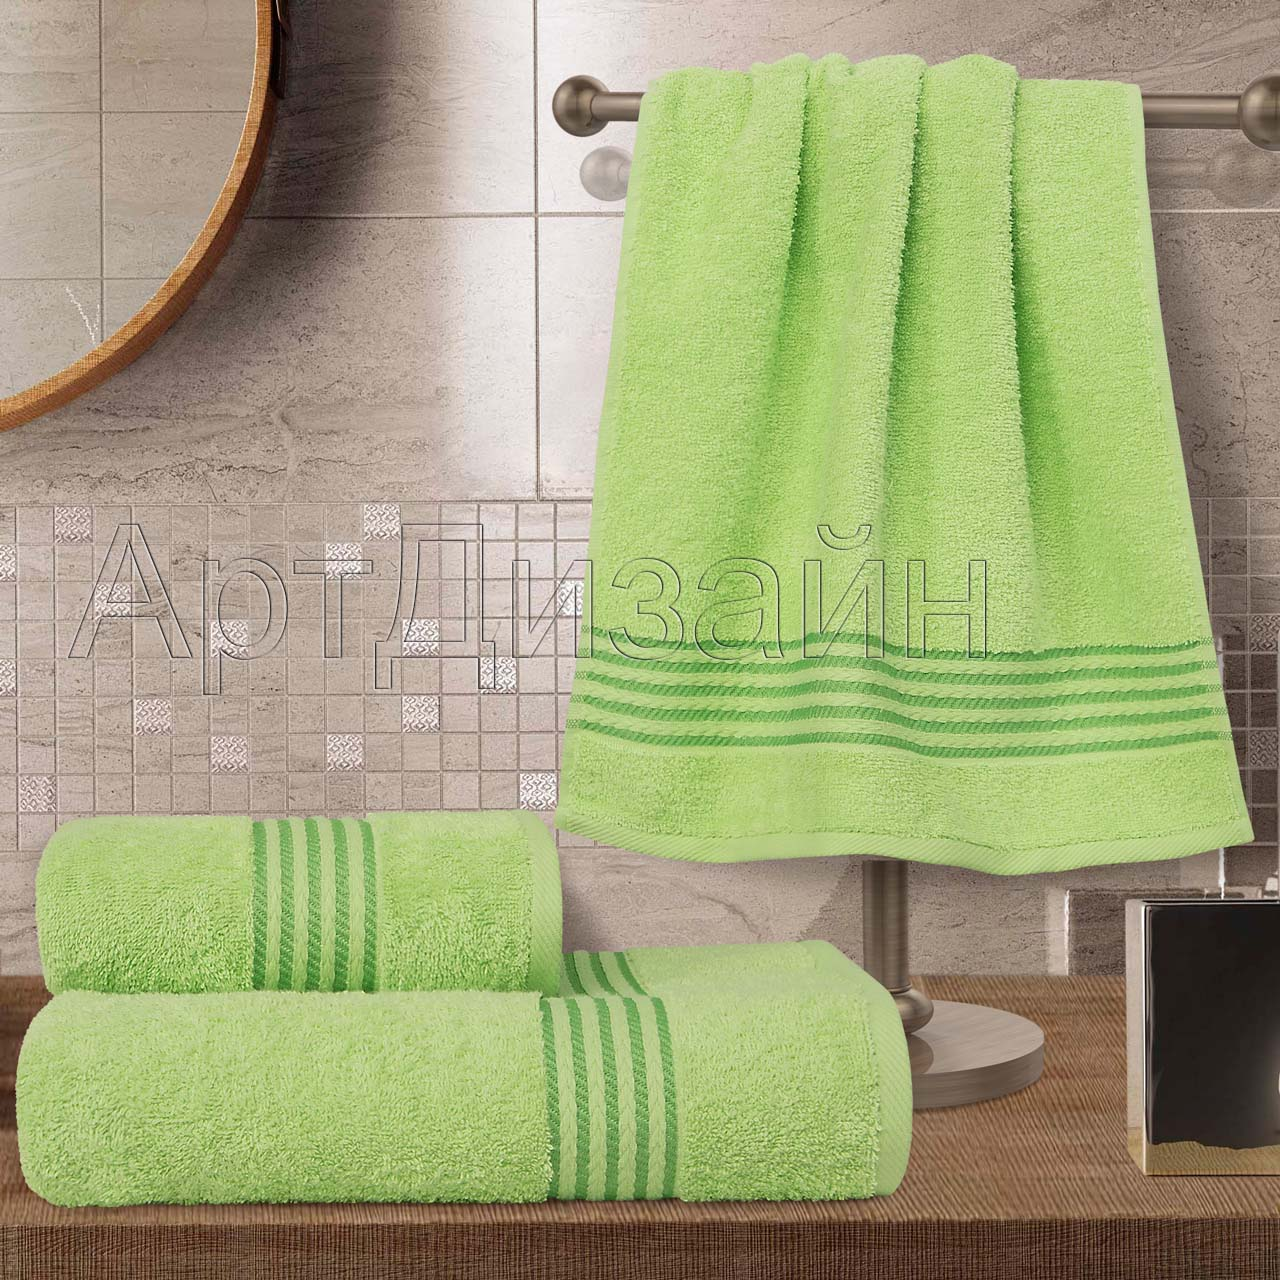 Полотенце Классик Светло-зеленый р. 40х70Махровые полотенца<br>Плотность:400 г/кв. м<br><br>Тип: Полотенце<br>Размер: 40х70<br>Материал: Махра